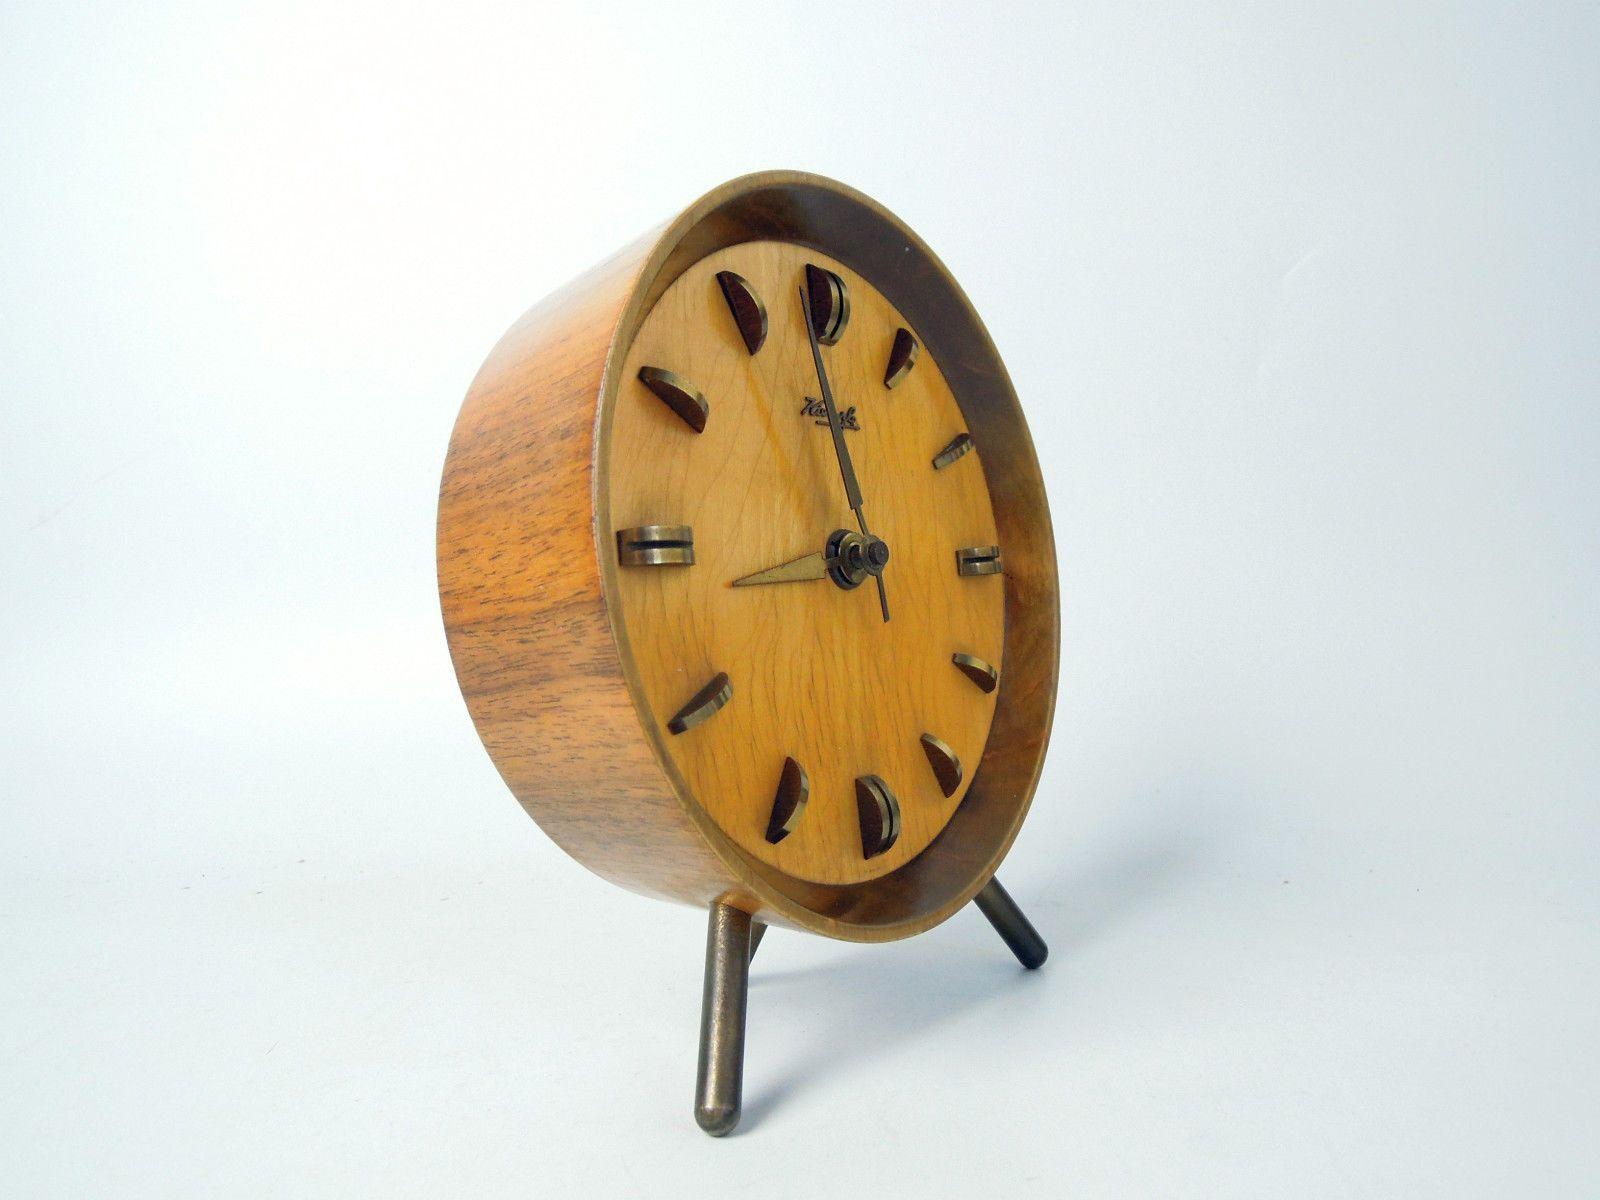 Details about DESIGN ANKER DESK CLOCK MID CENTURY MODERN ...